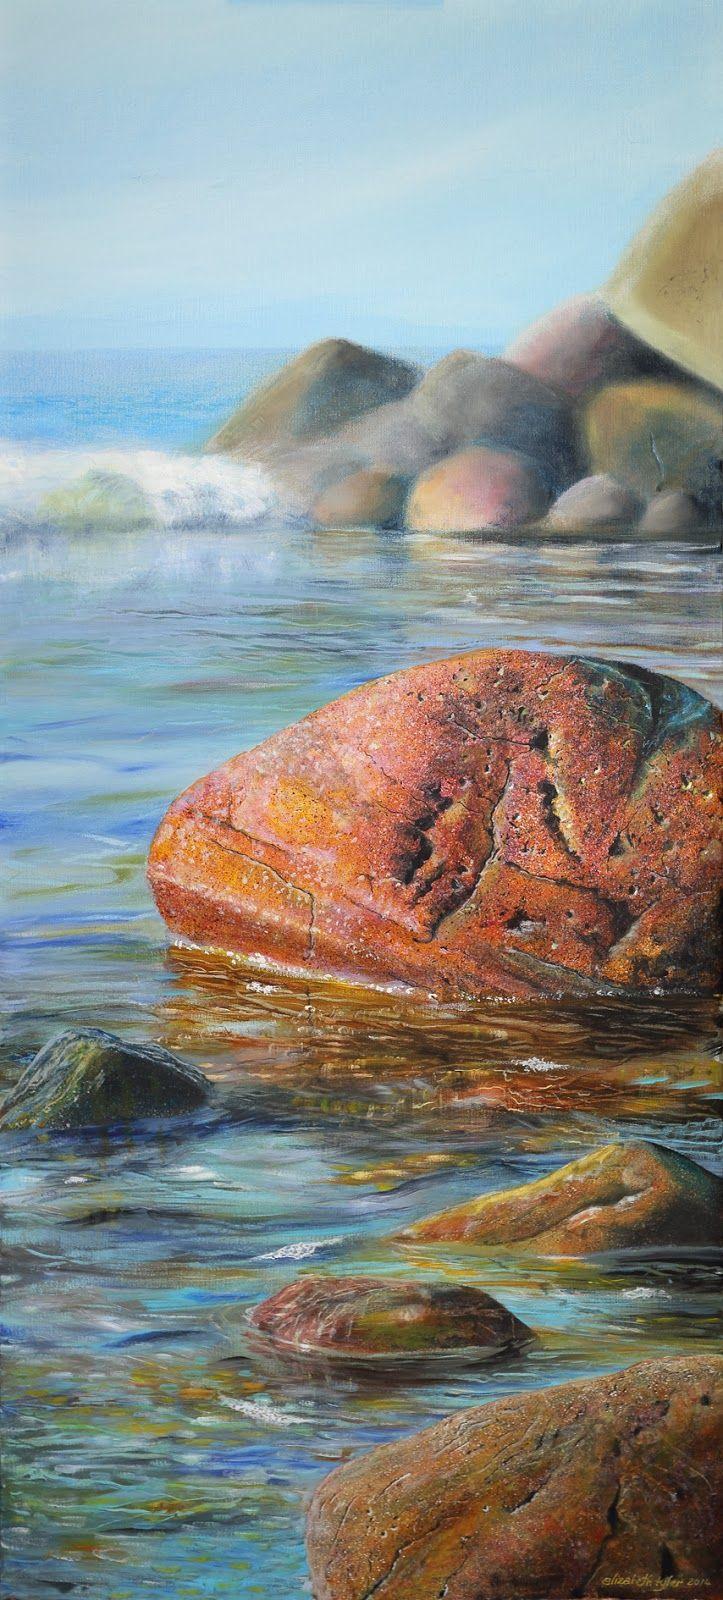 Watercolor artist magazine palm coast fl - Artist Elizabeth Tyler